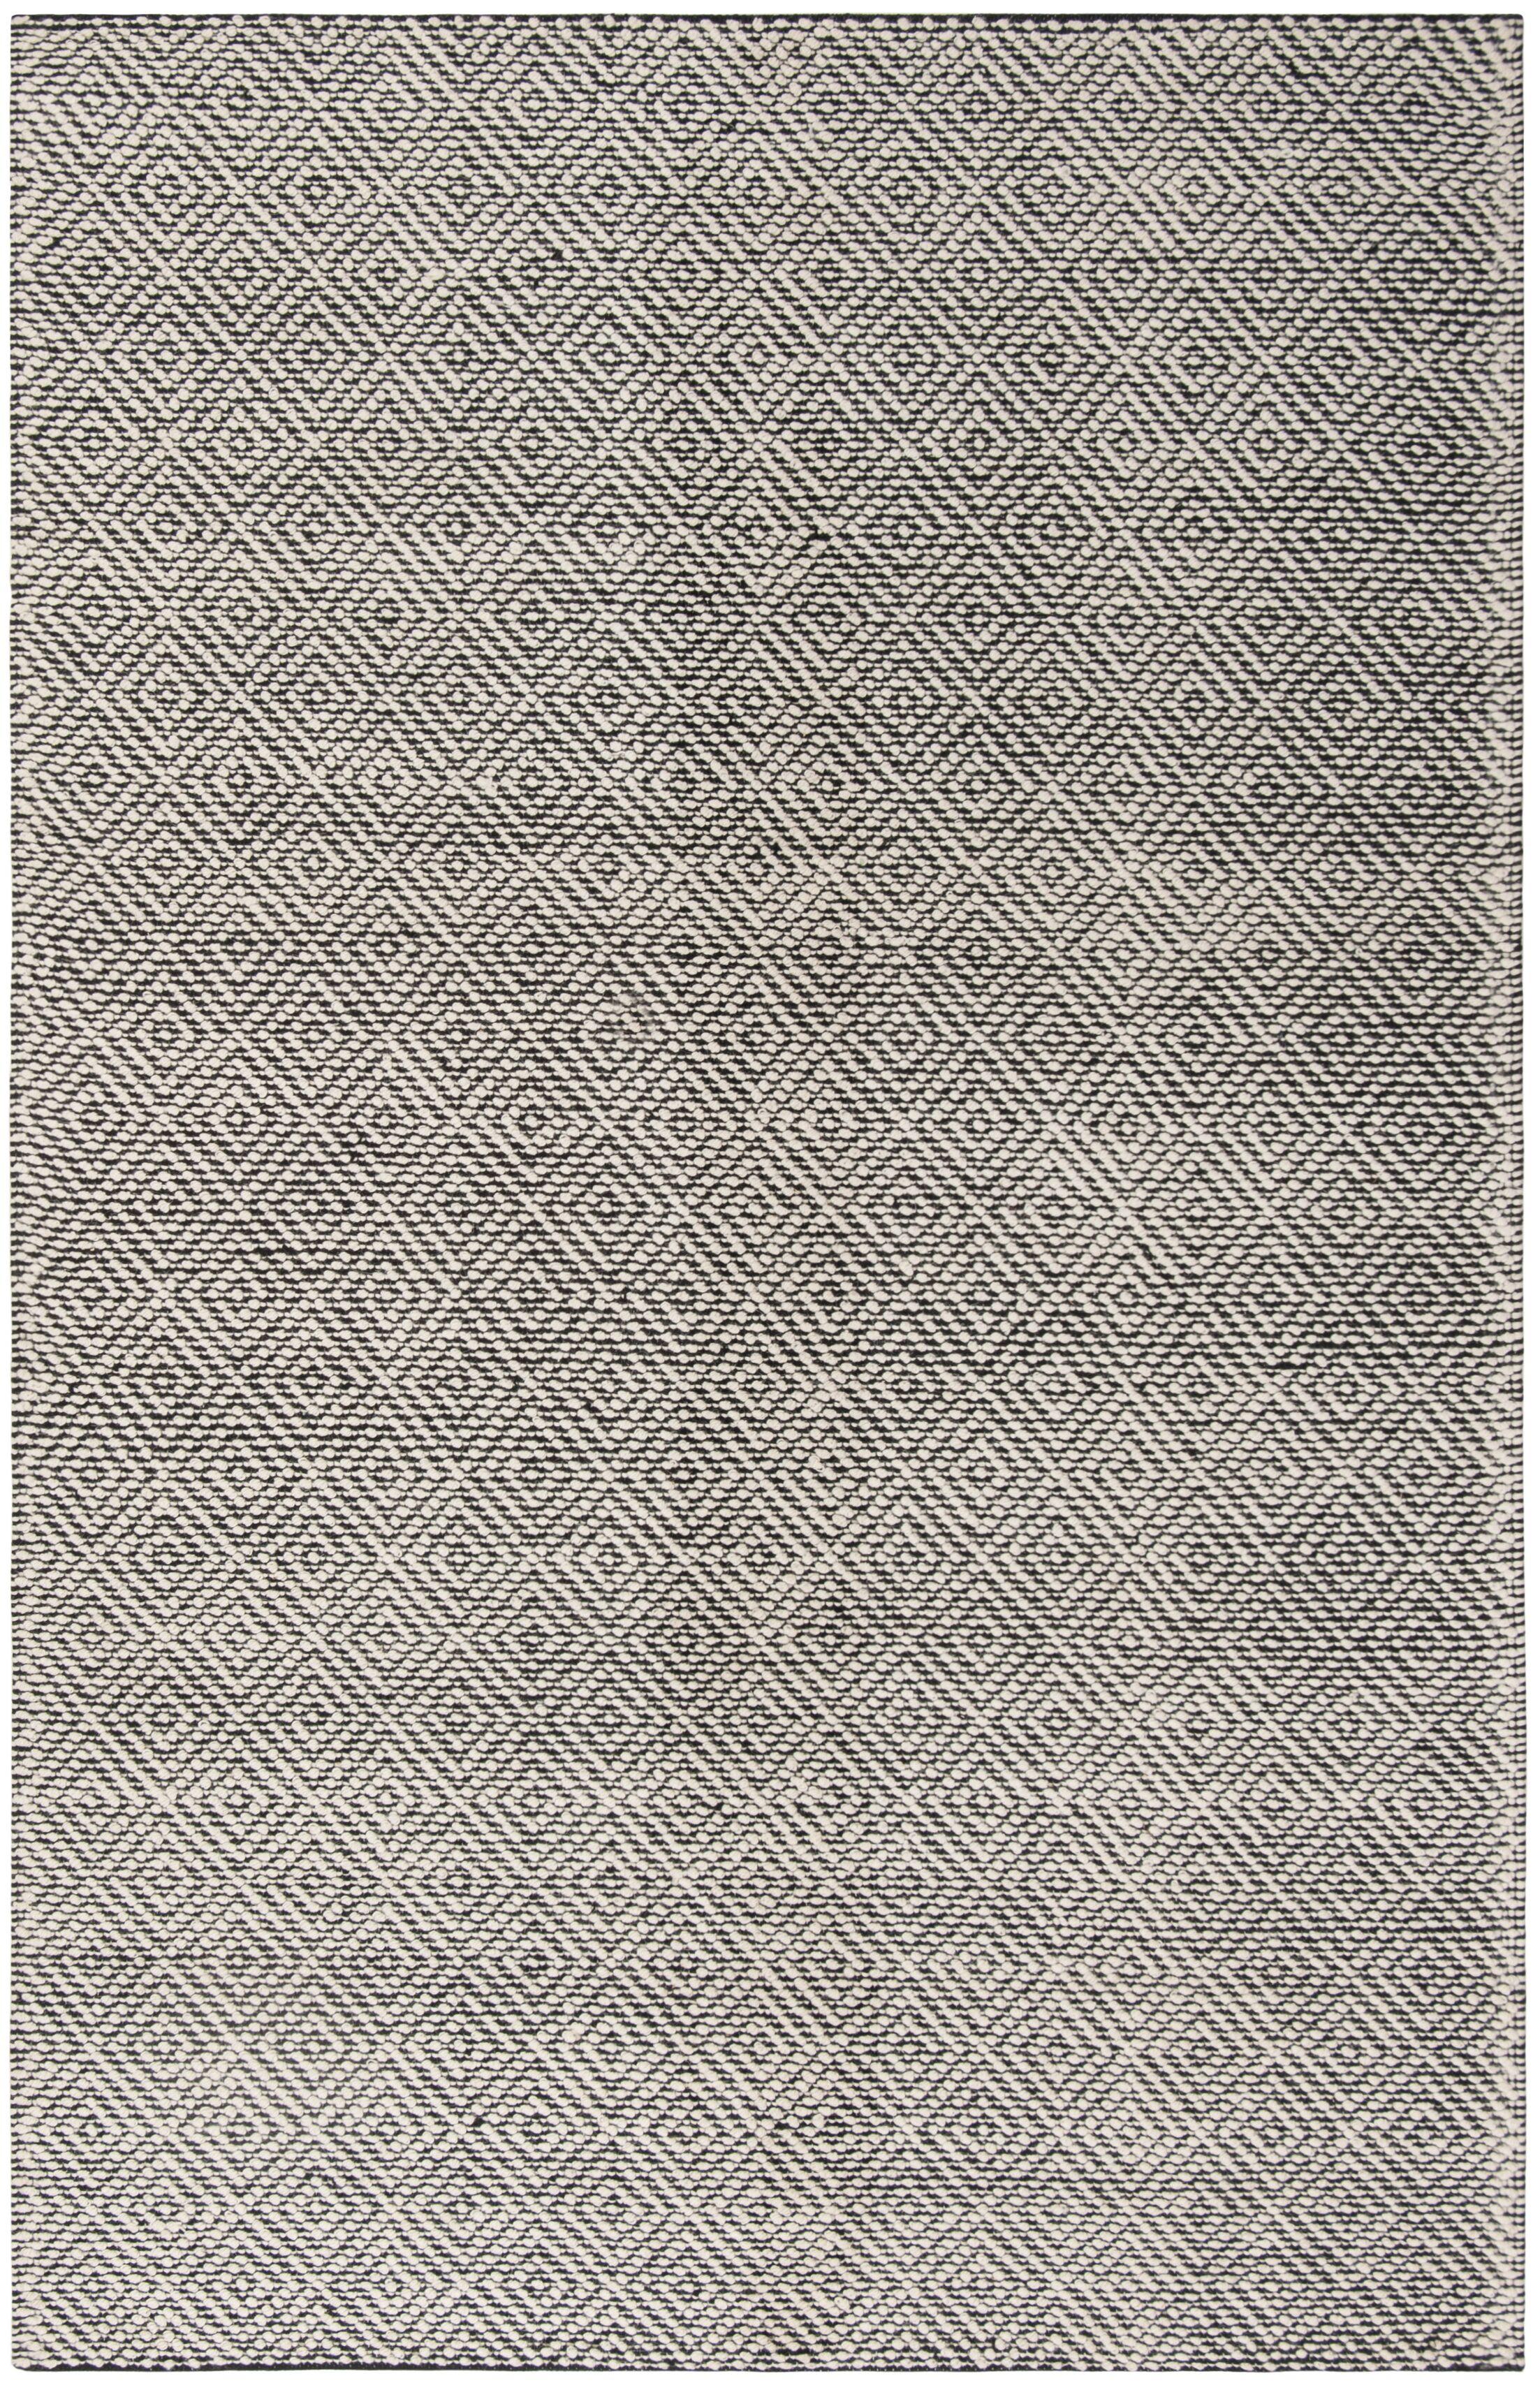 Matchett Hand-Woven Wool Ivory/Black Area Rug Rug Size: Rectangle 4' x 6'